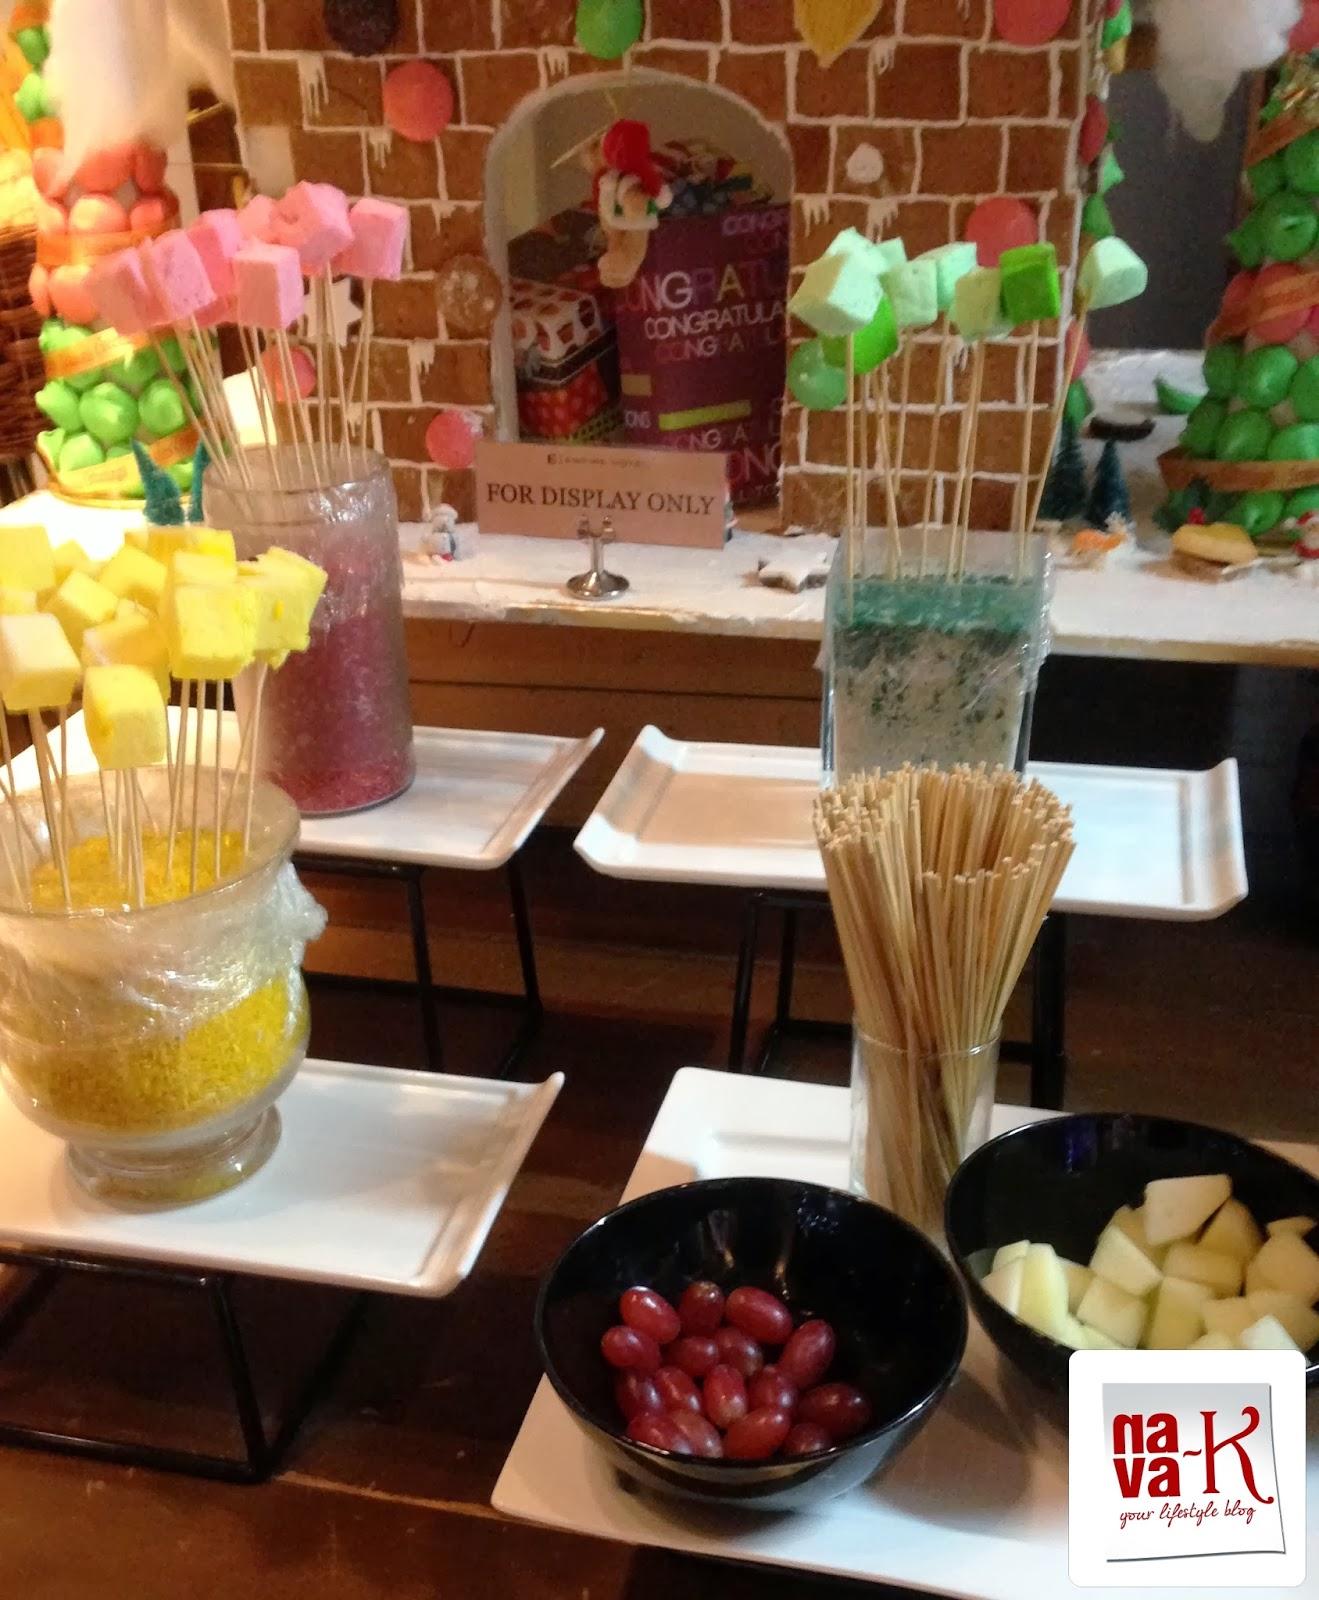 Subang Jaya Kitchen Cabinet: Nava-k: Kitchen Art Brasserie @ Empire Hotel Subang